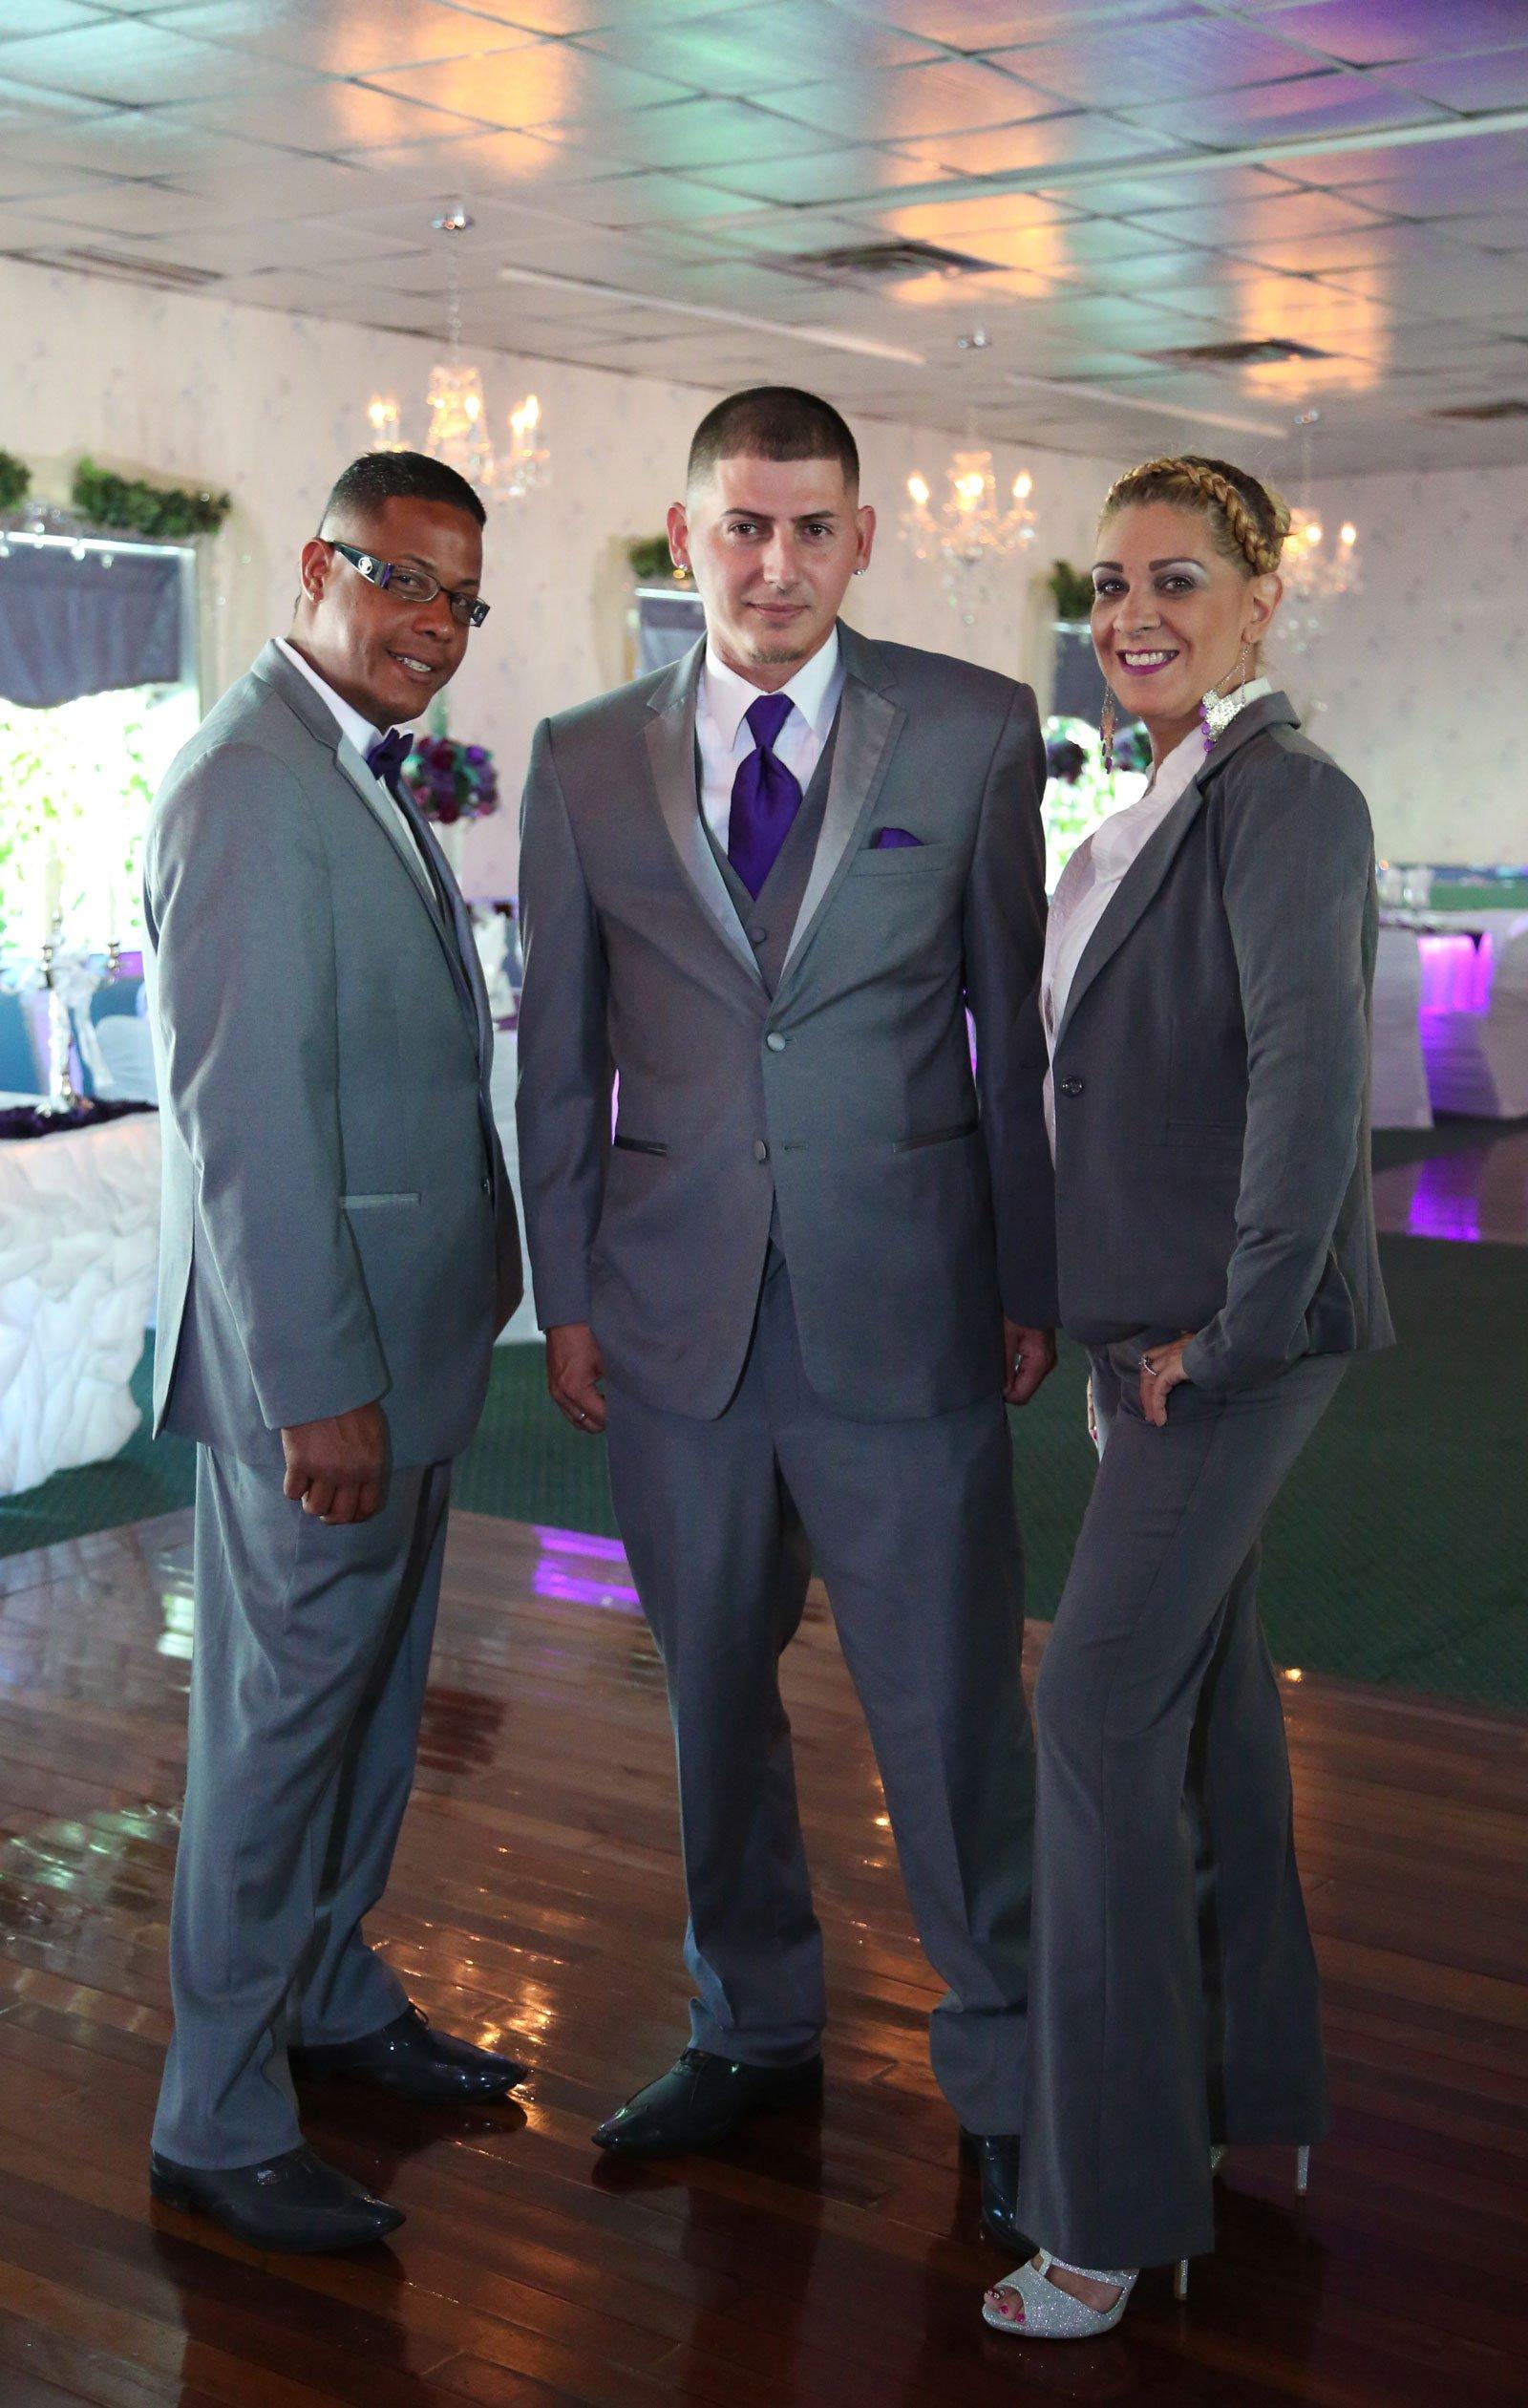 Buffalo, NY Wedding Reception groom with groomsmen